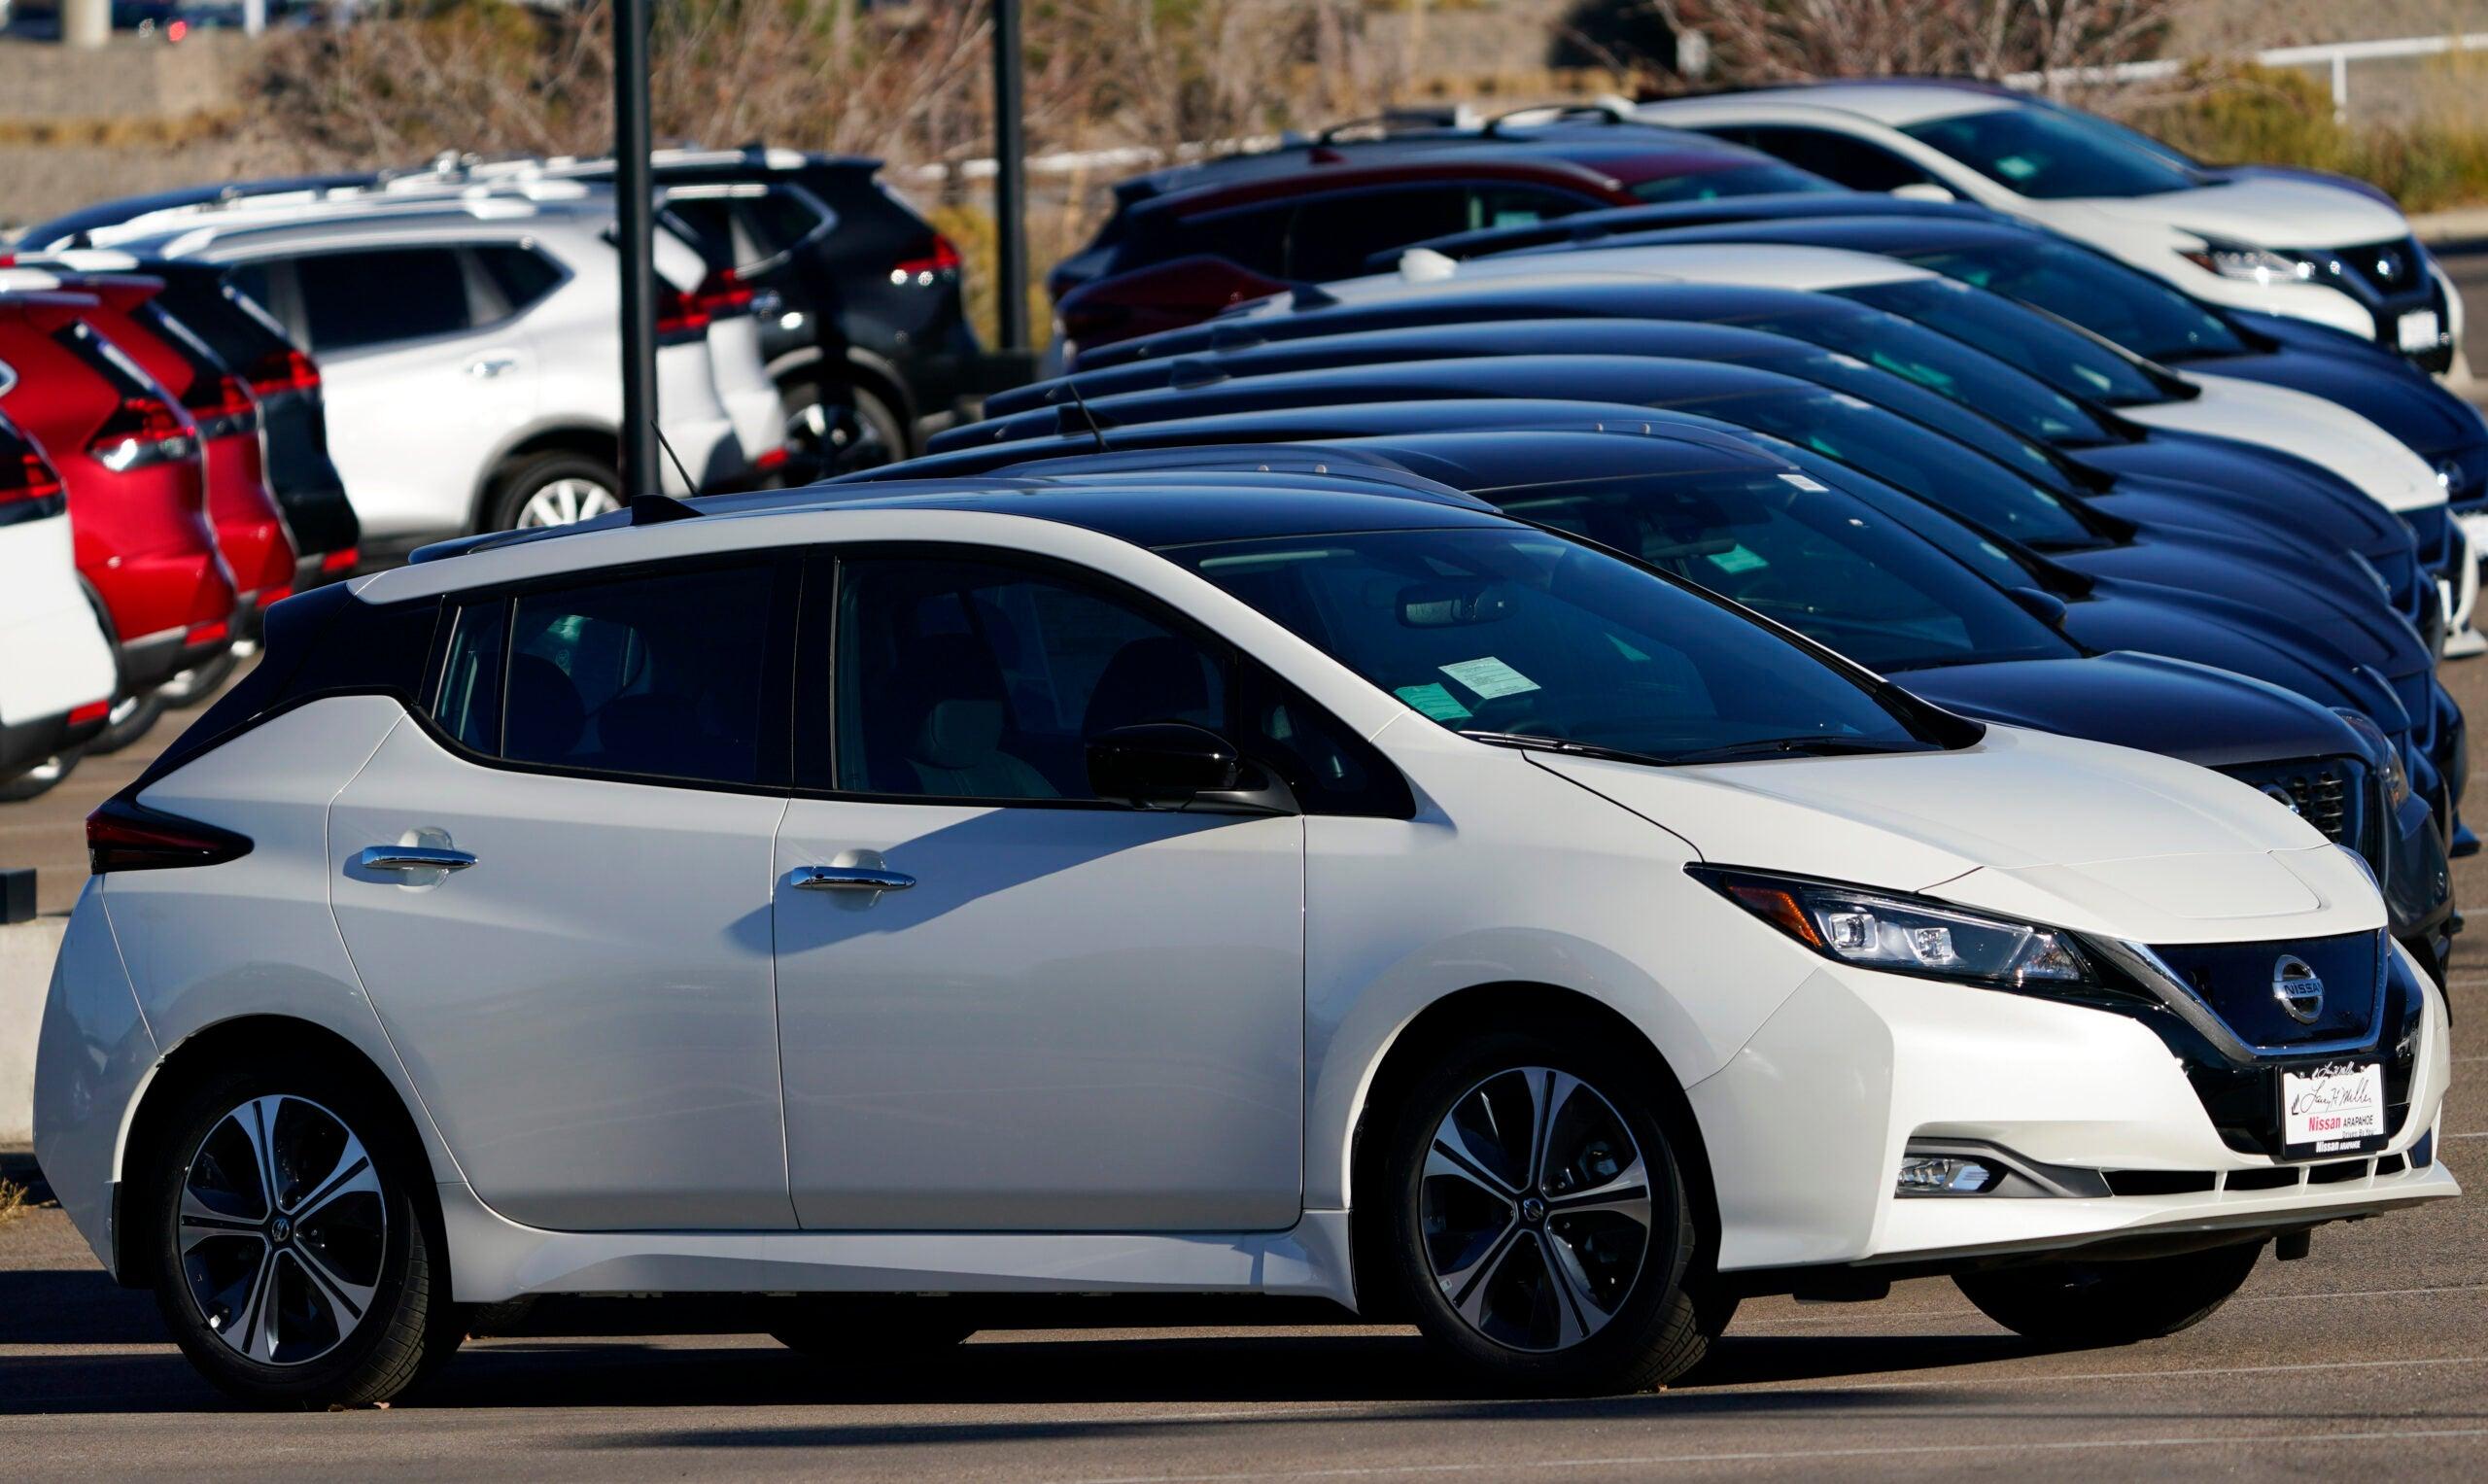 2021 Nissan Leaf electric vehicles